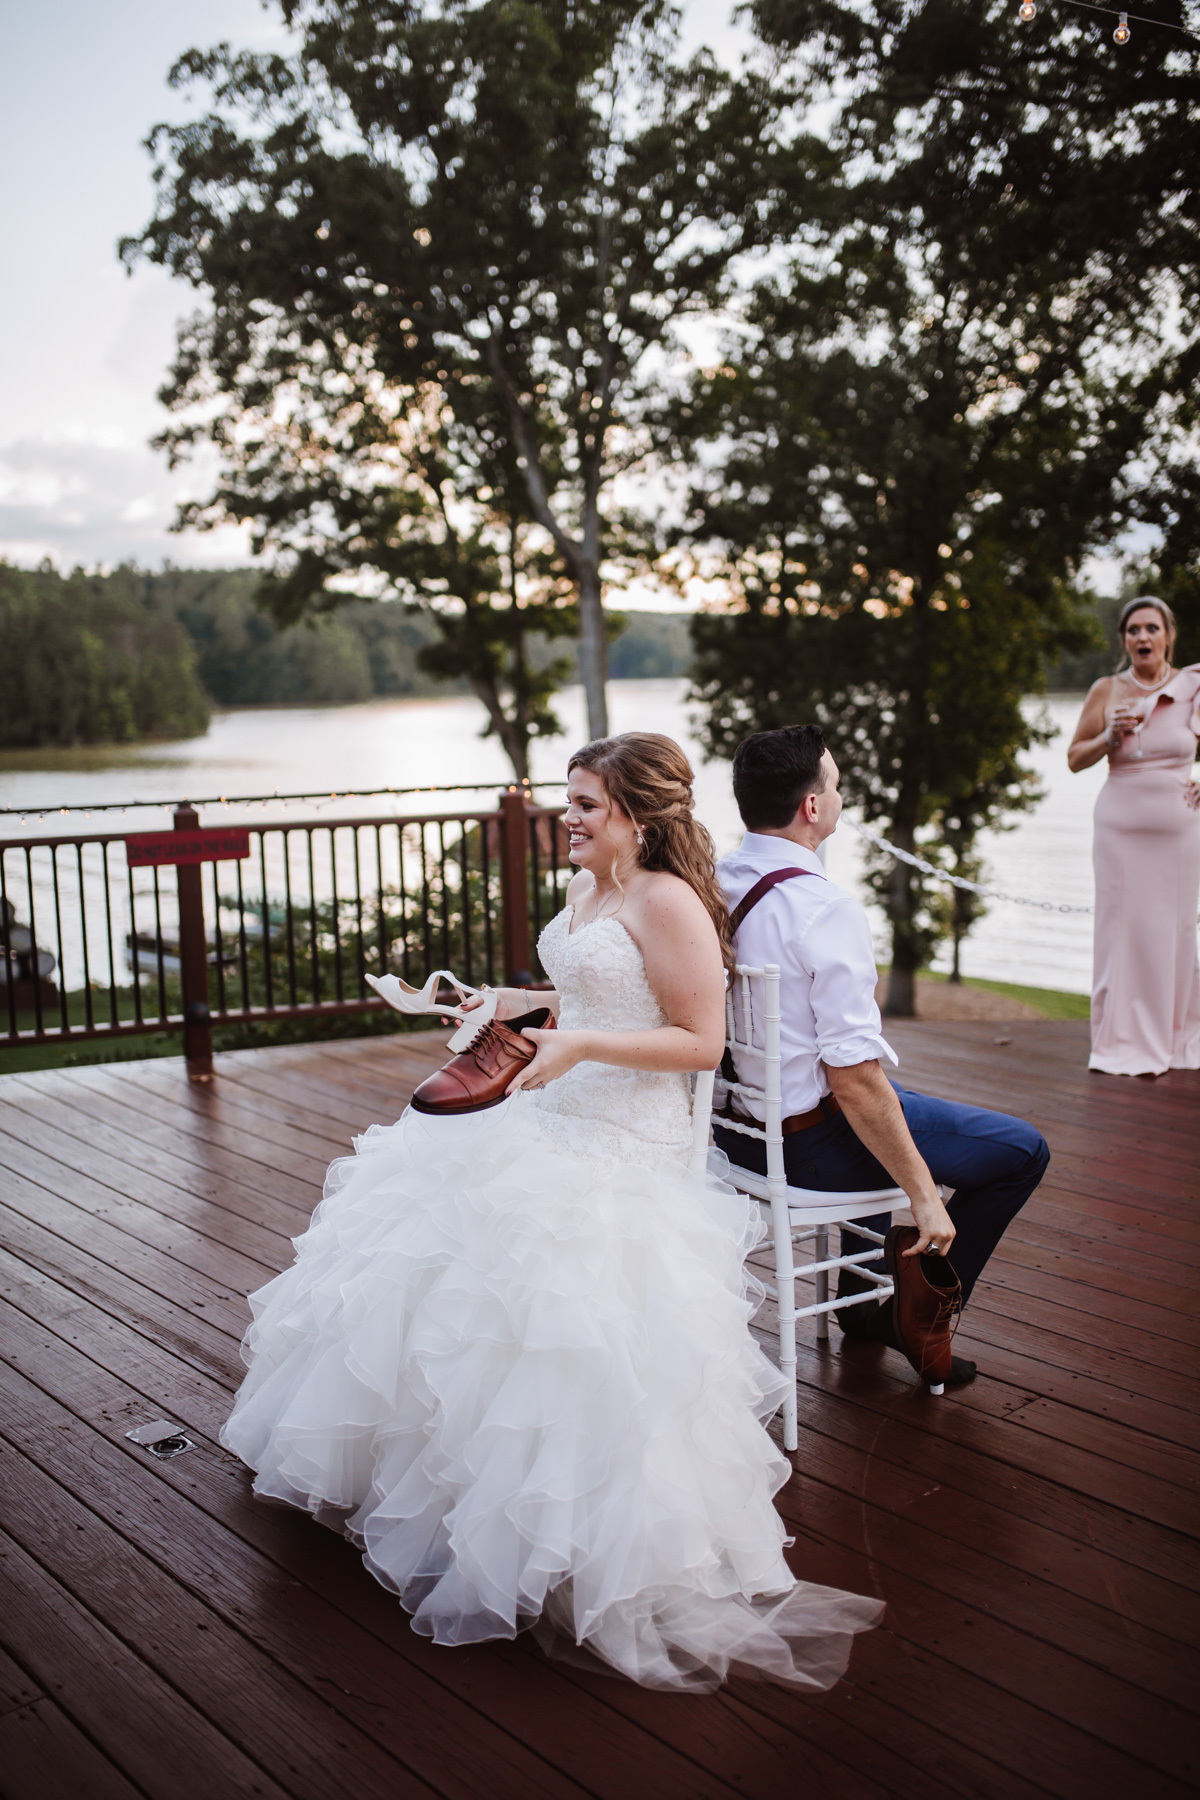 Bella Collina Wedding Reception | Kayli LaFon Photography, Greensboro Winston-Salem NC Photographerensboro Winston-Salem NC Photographer